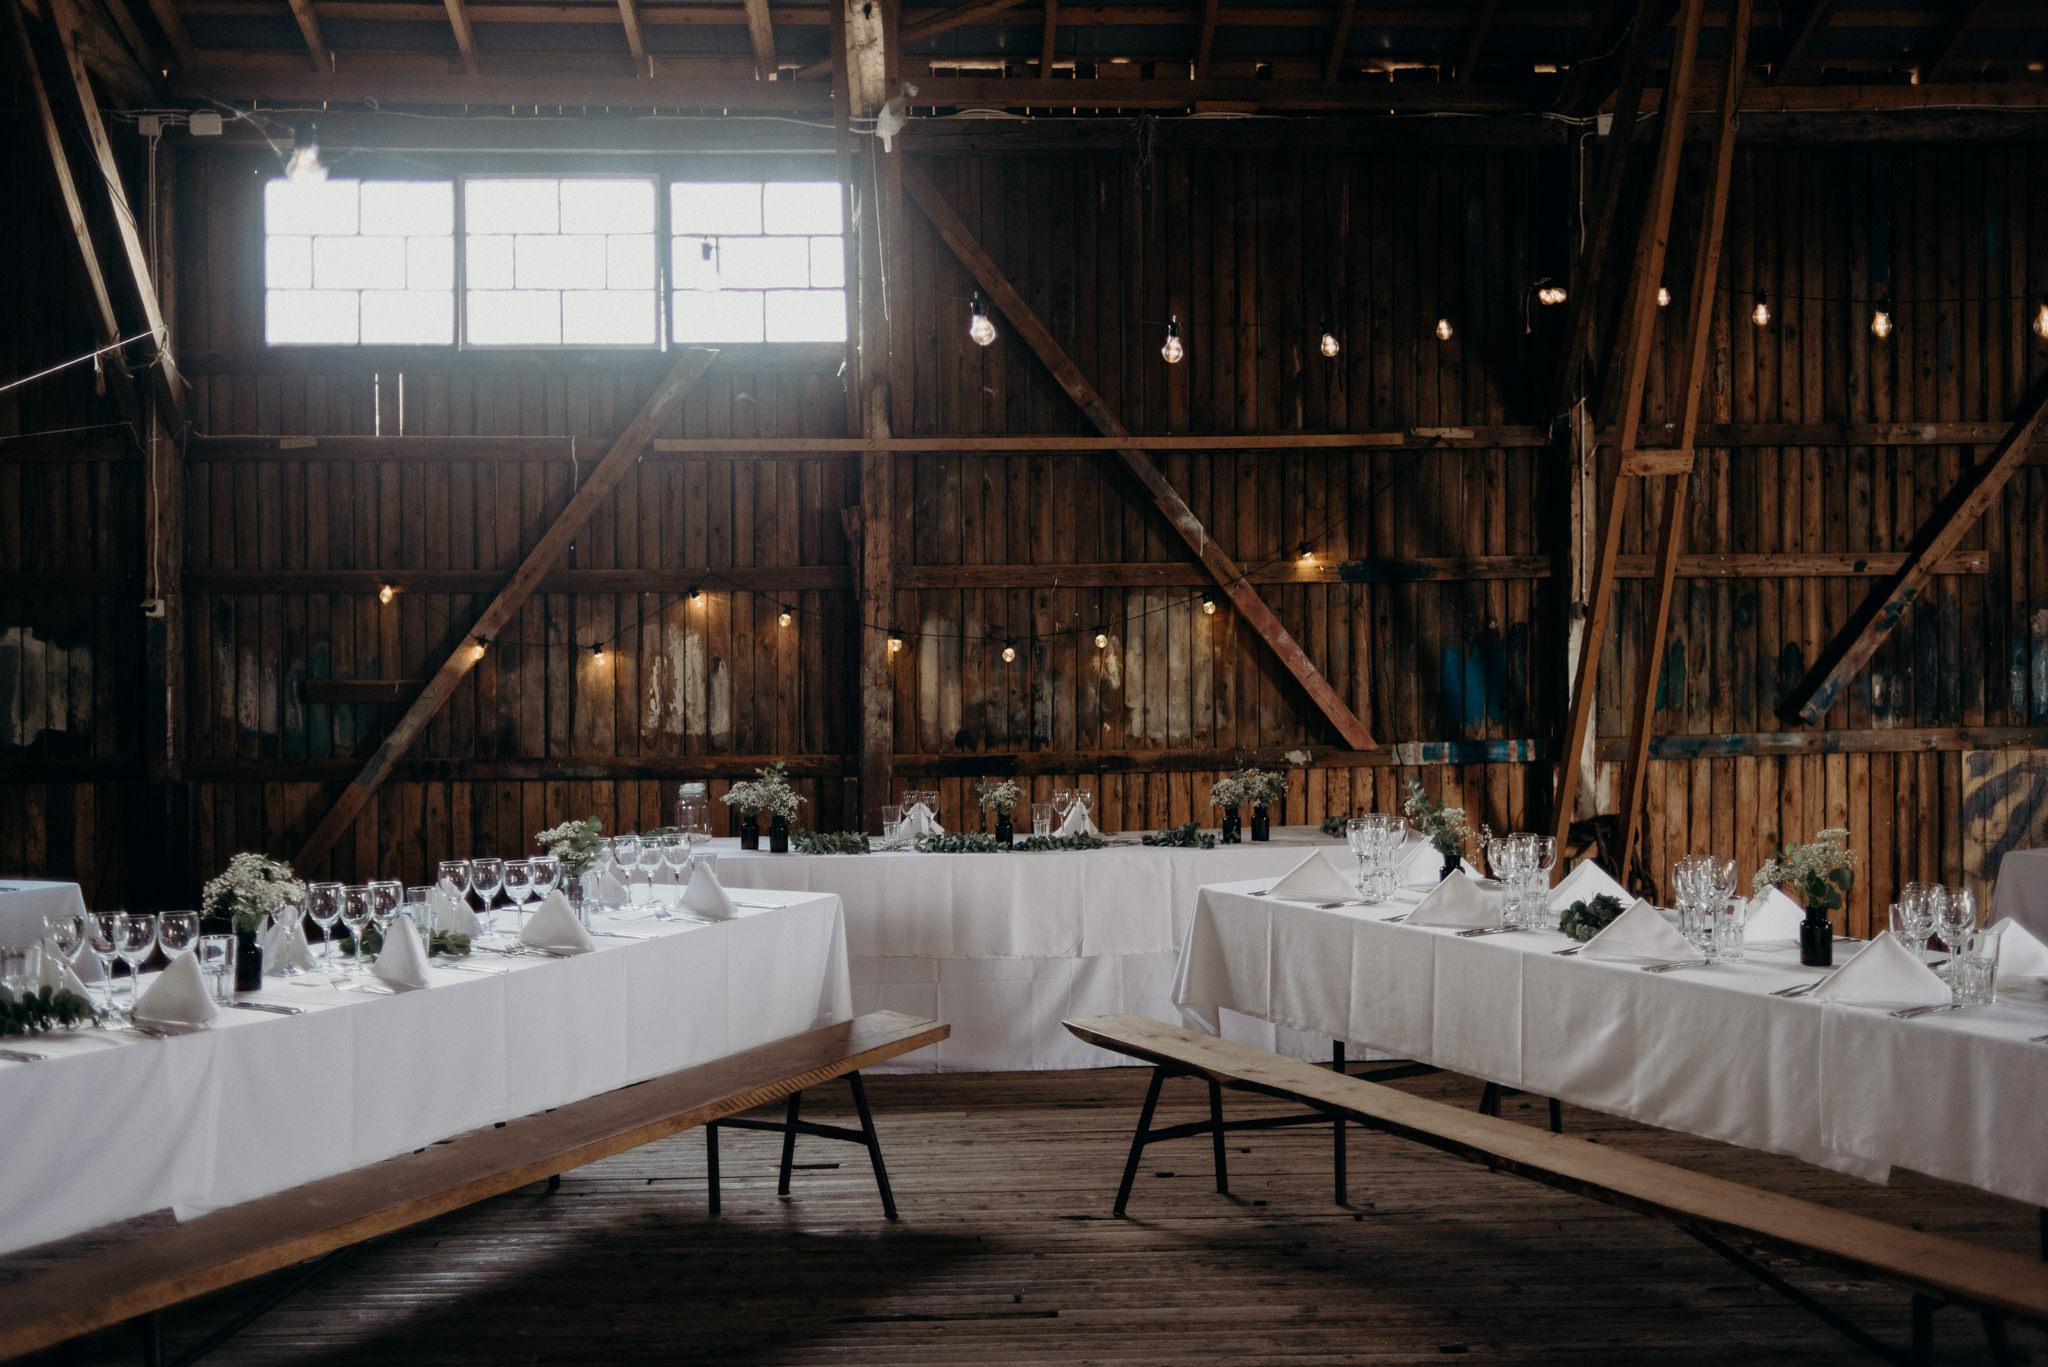 Valkosaaren Telakka wedding reception details